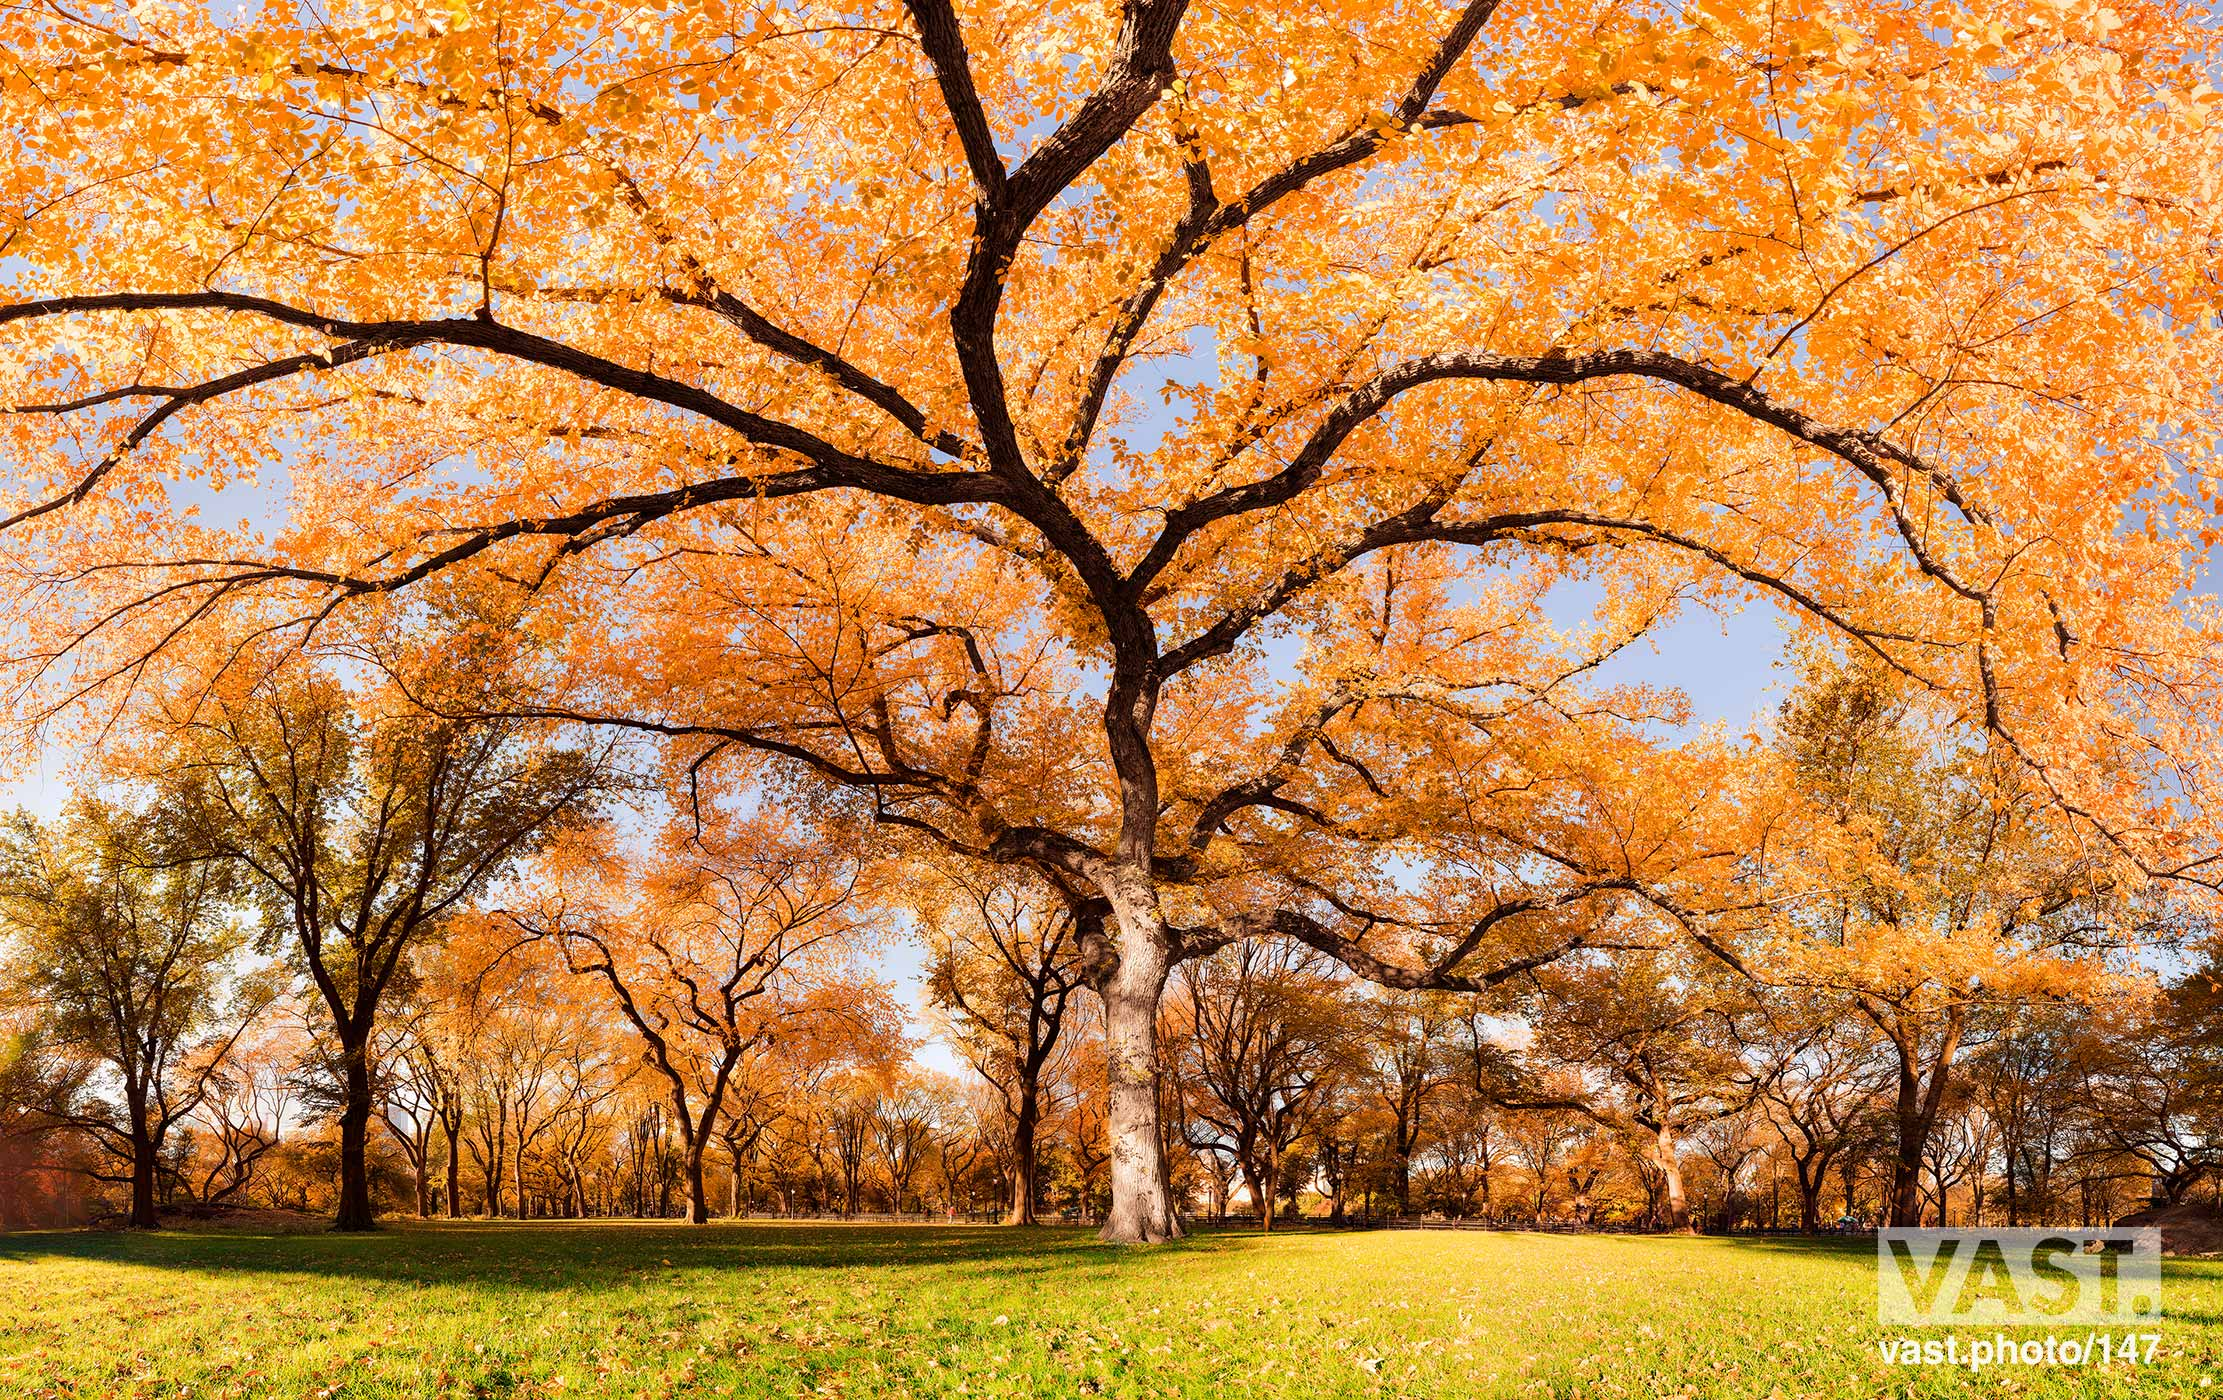 Autumn Foliage & Trees: Fine Art Photo Prints - VAST